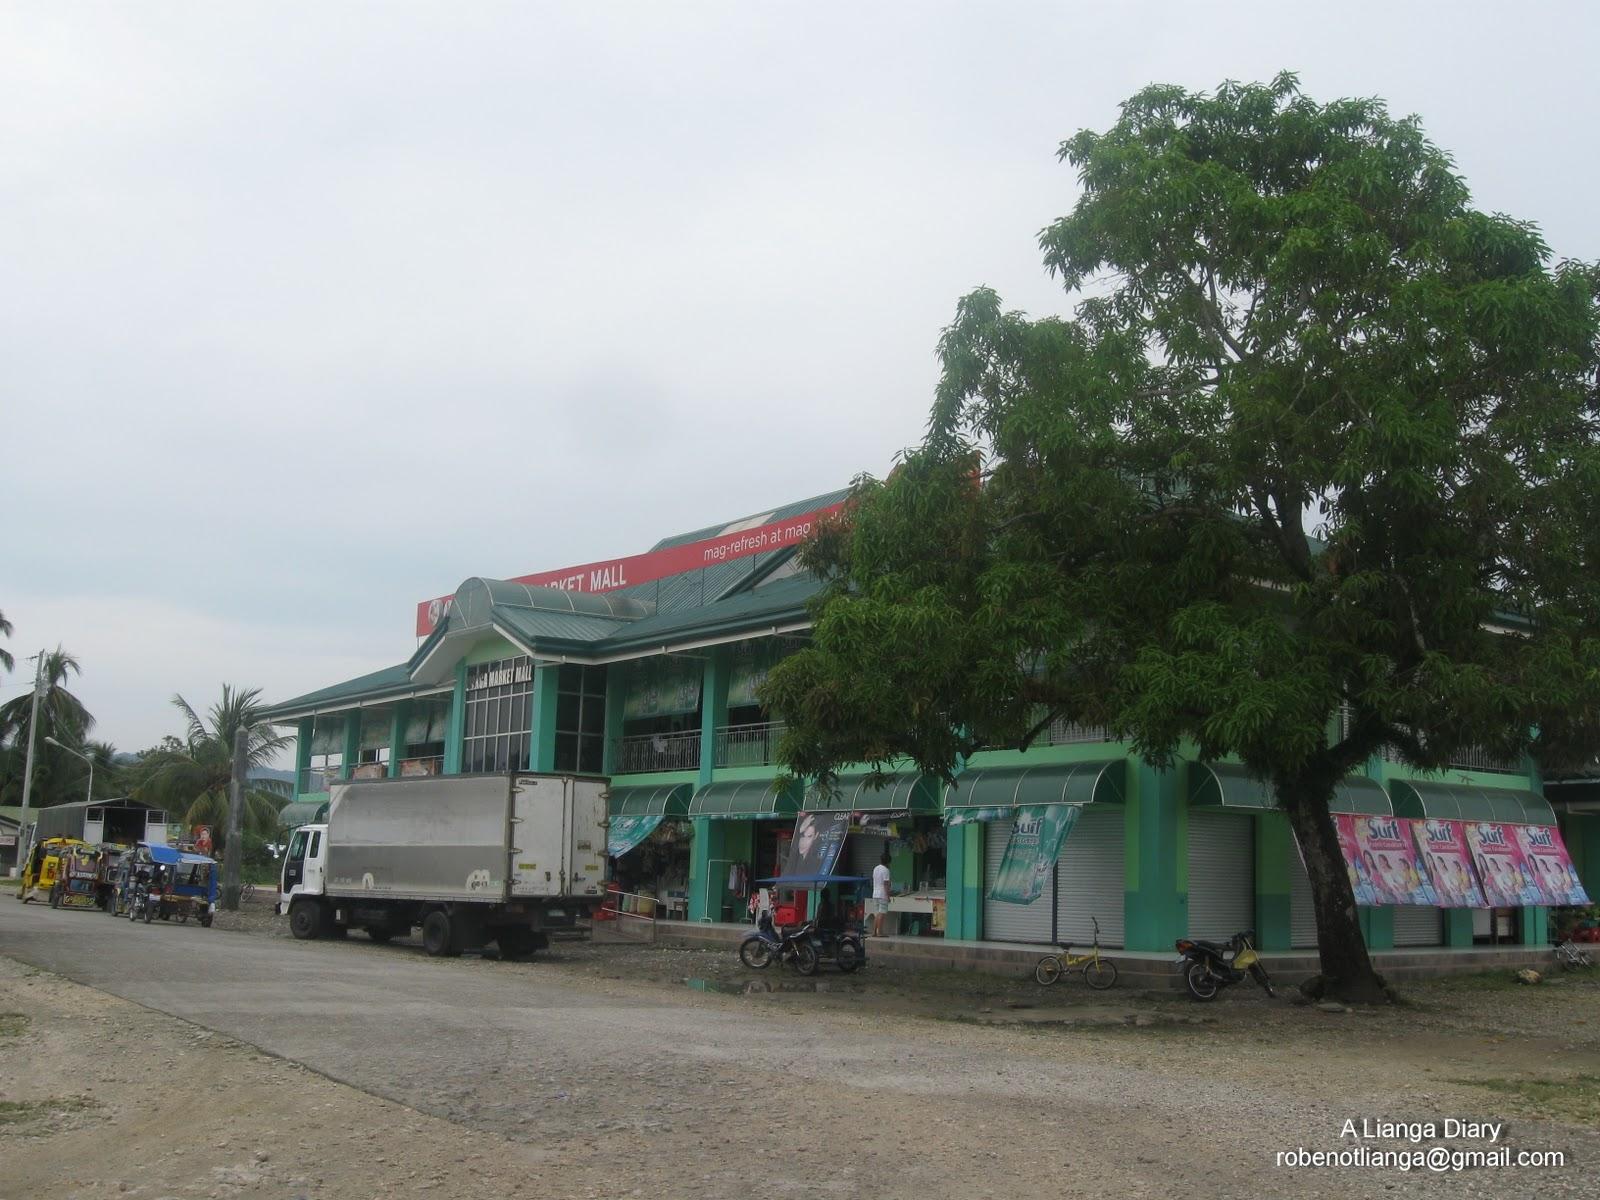 A Lianga Diary: Kamayo